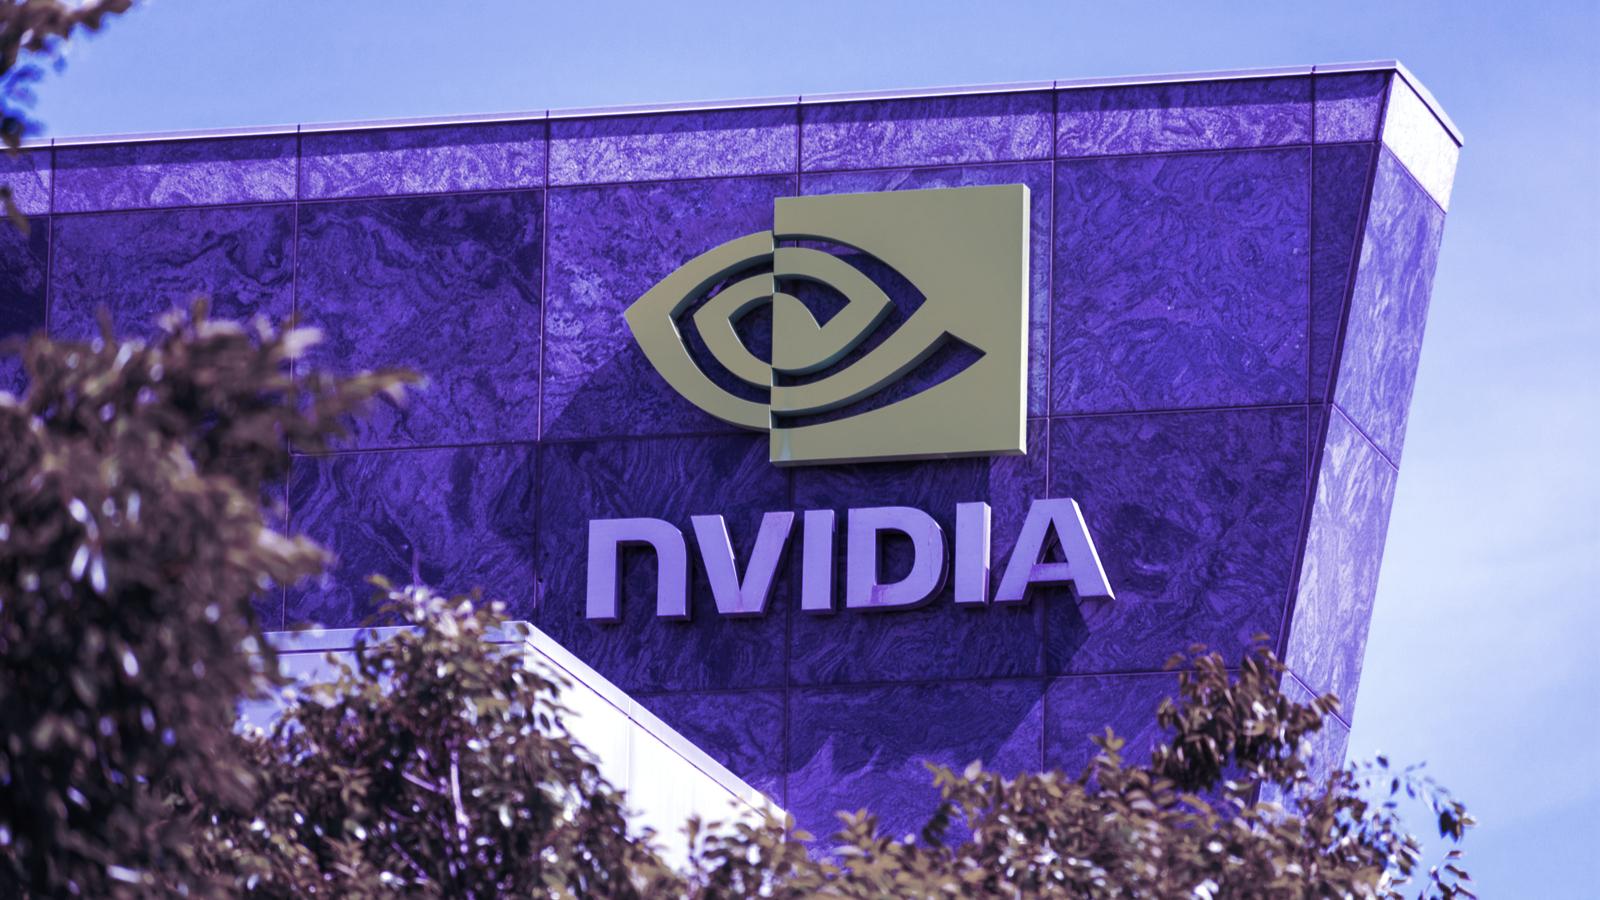 Nvidia Made $155 Million From Crypto Mining Chips Last Quarter